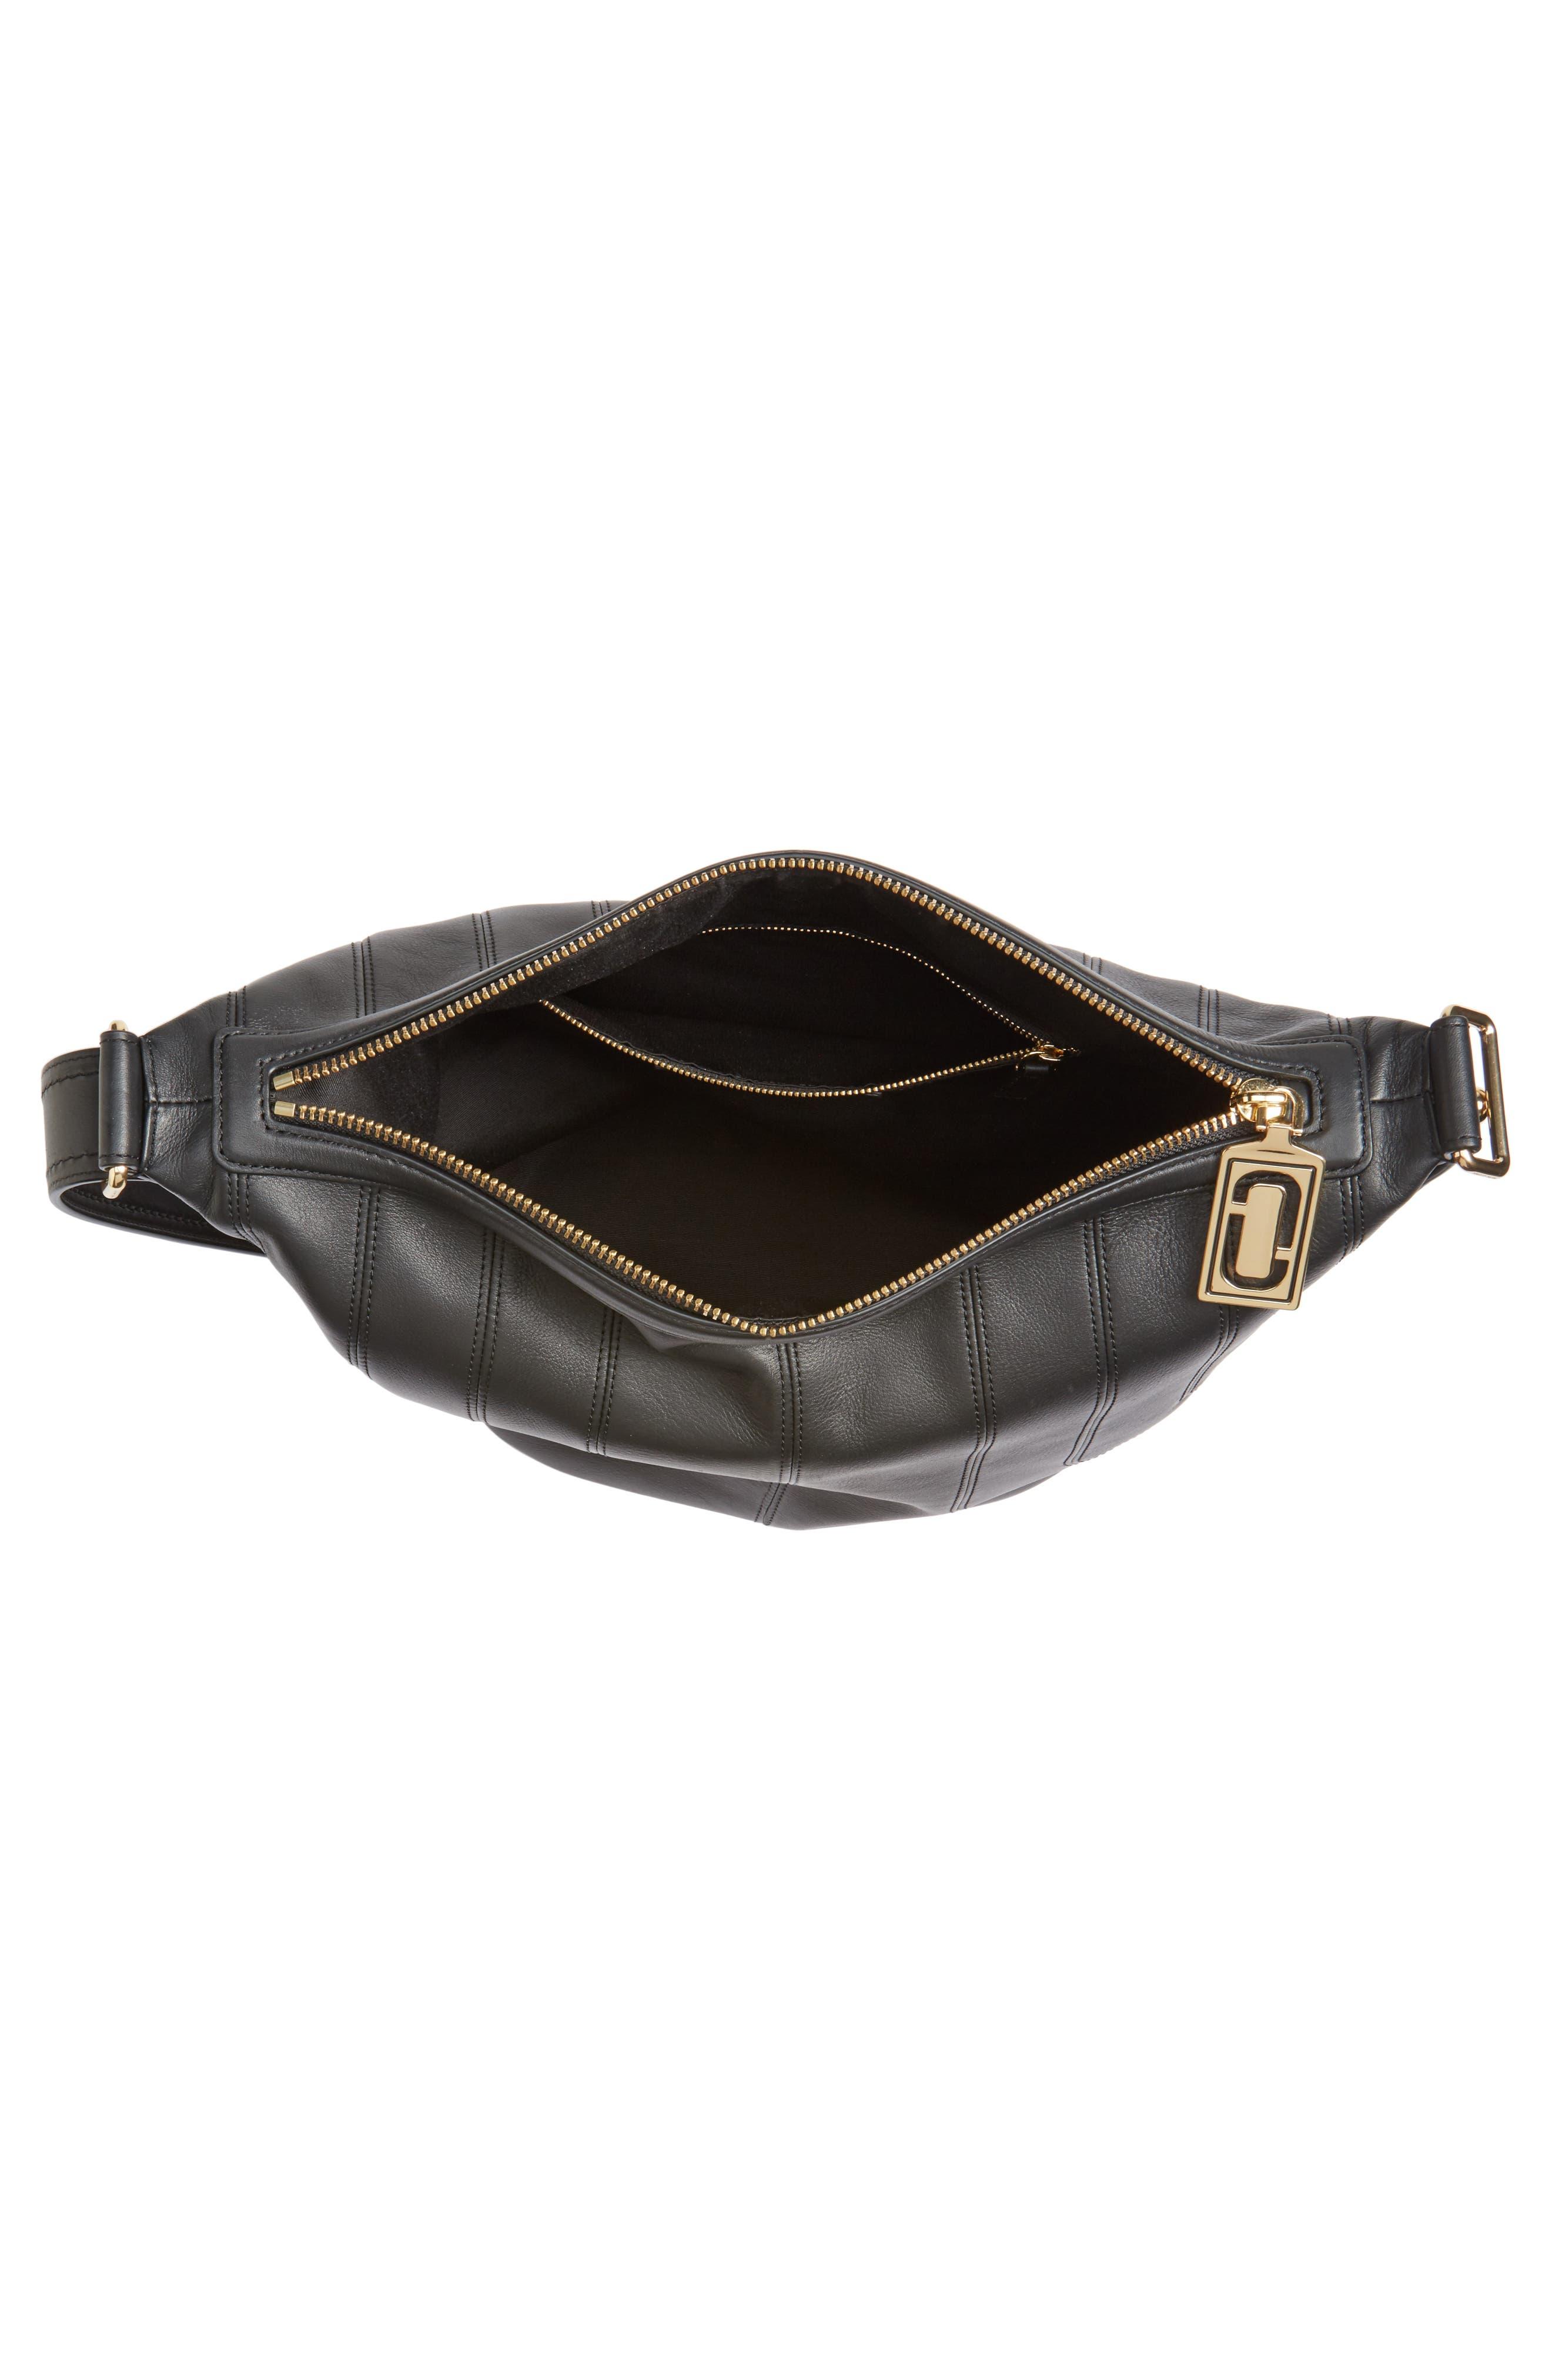 Alternate Image 3  - MARC JACOBS The Sling Mod Leather Hobo/Crossbody/Sling Bag